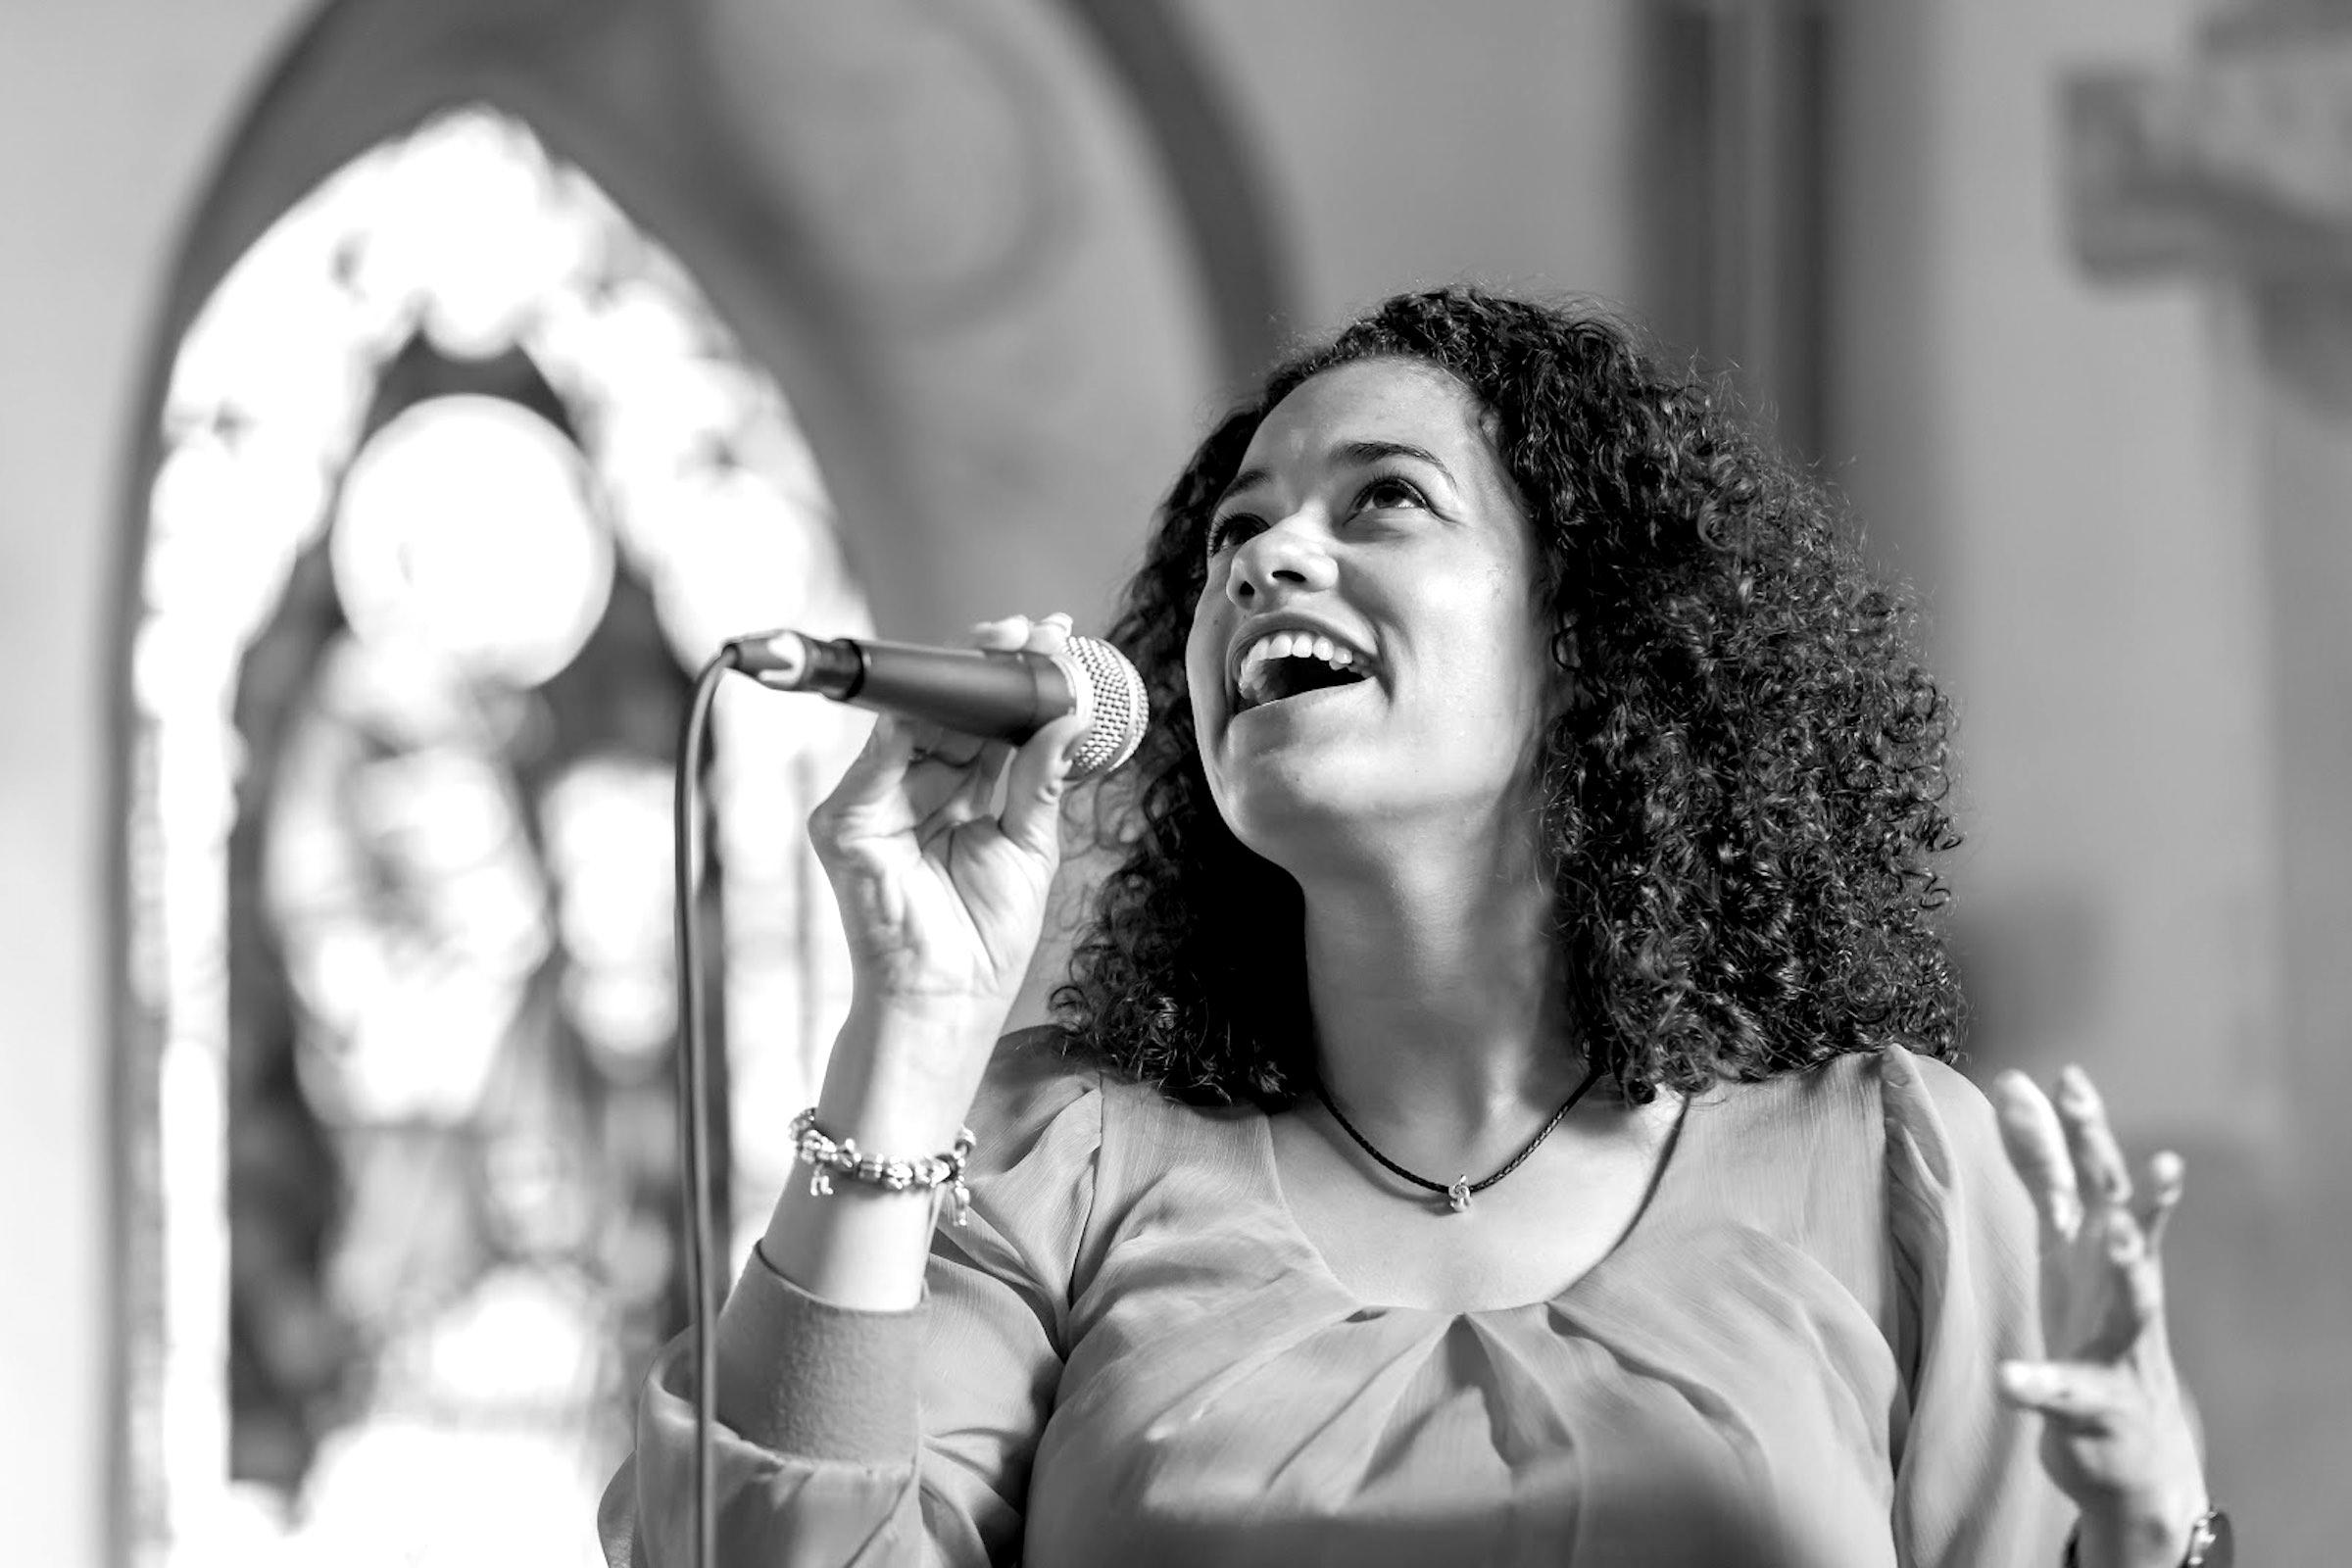 hochzeitssängerin | Hannover | Sängerin | Kirchensängerin | Hochzeit | Lieder | Sängerin | Trauung | Sängerin | Trauung | Sängerin | Kirche | Preise | Buchen | Mieten | Nathalie | Chérestal | Lehmann | Eventservice